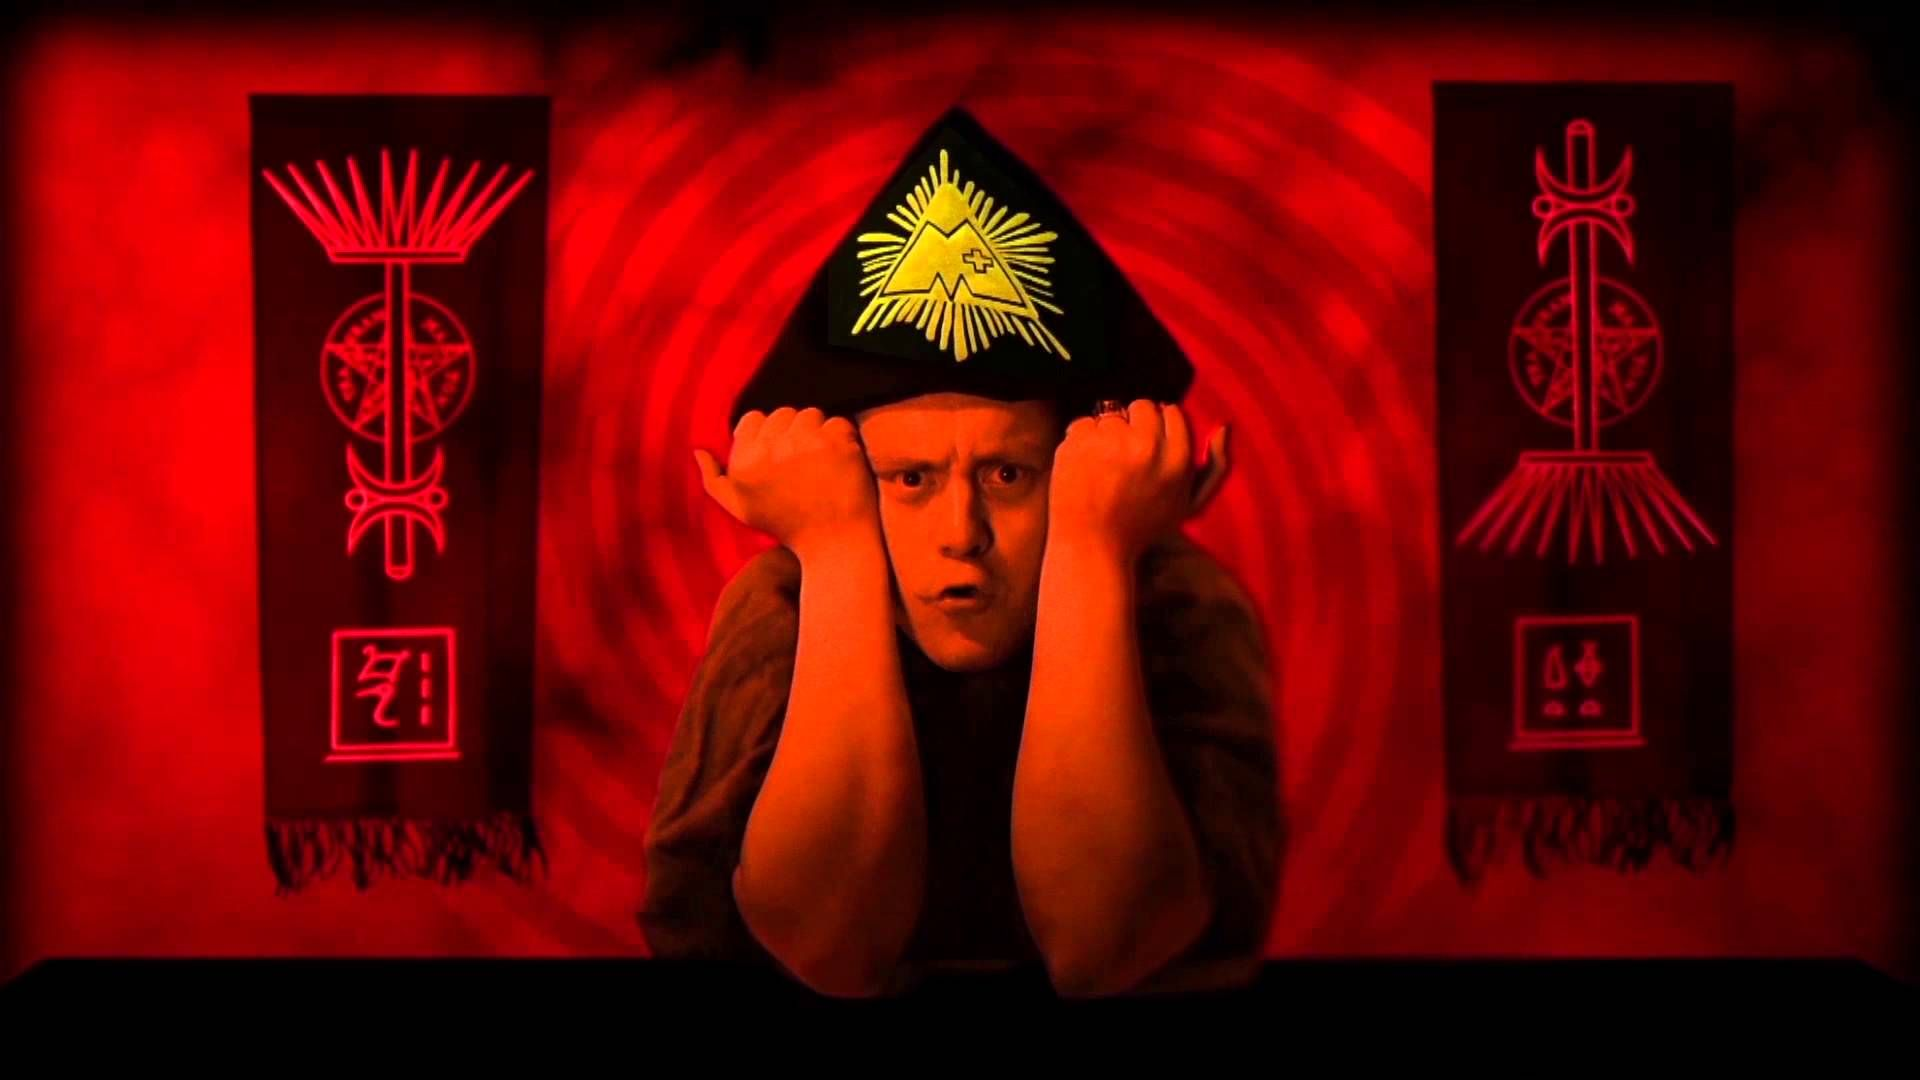 ✔ Artists: Morlockk Dilemma ✔ Title: Bärenfell/Goldzahn ✔ Country: Germany http://newvideohiphoprap.blogspot.ca/2015/10/morlockk-dilemma-barenfellgoldzahn.html